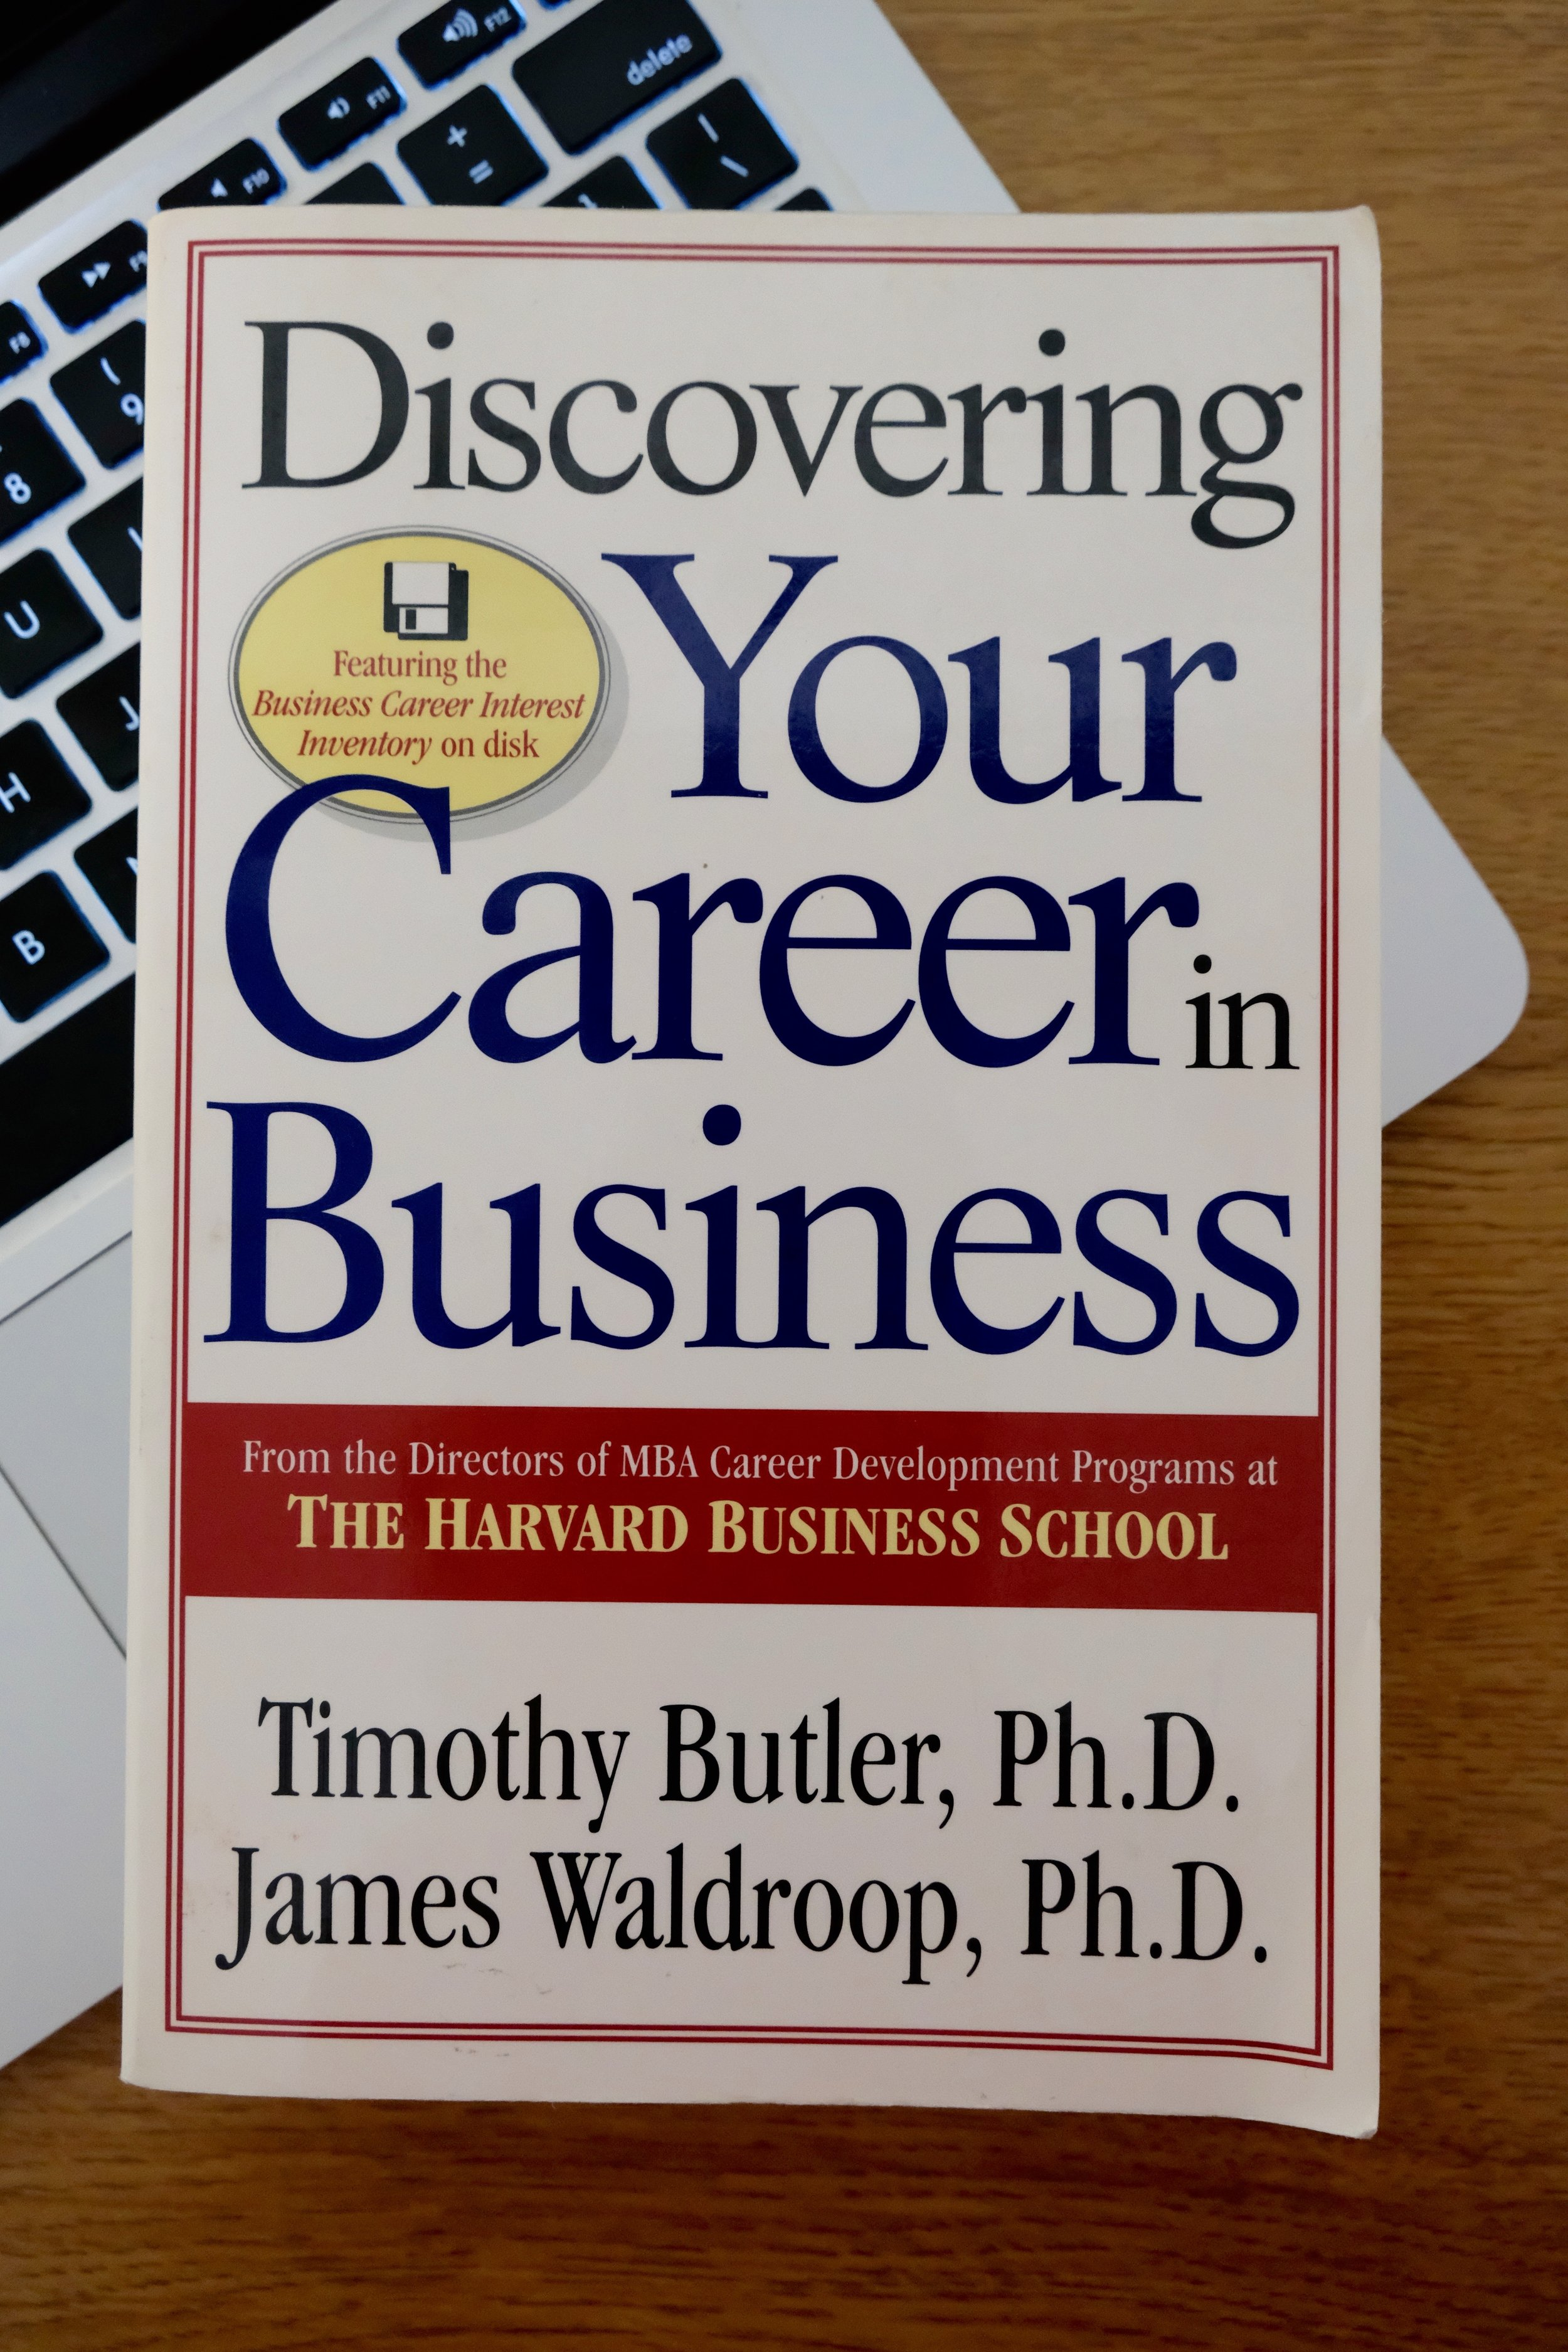 DiscoveringBook (1).jpg